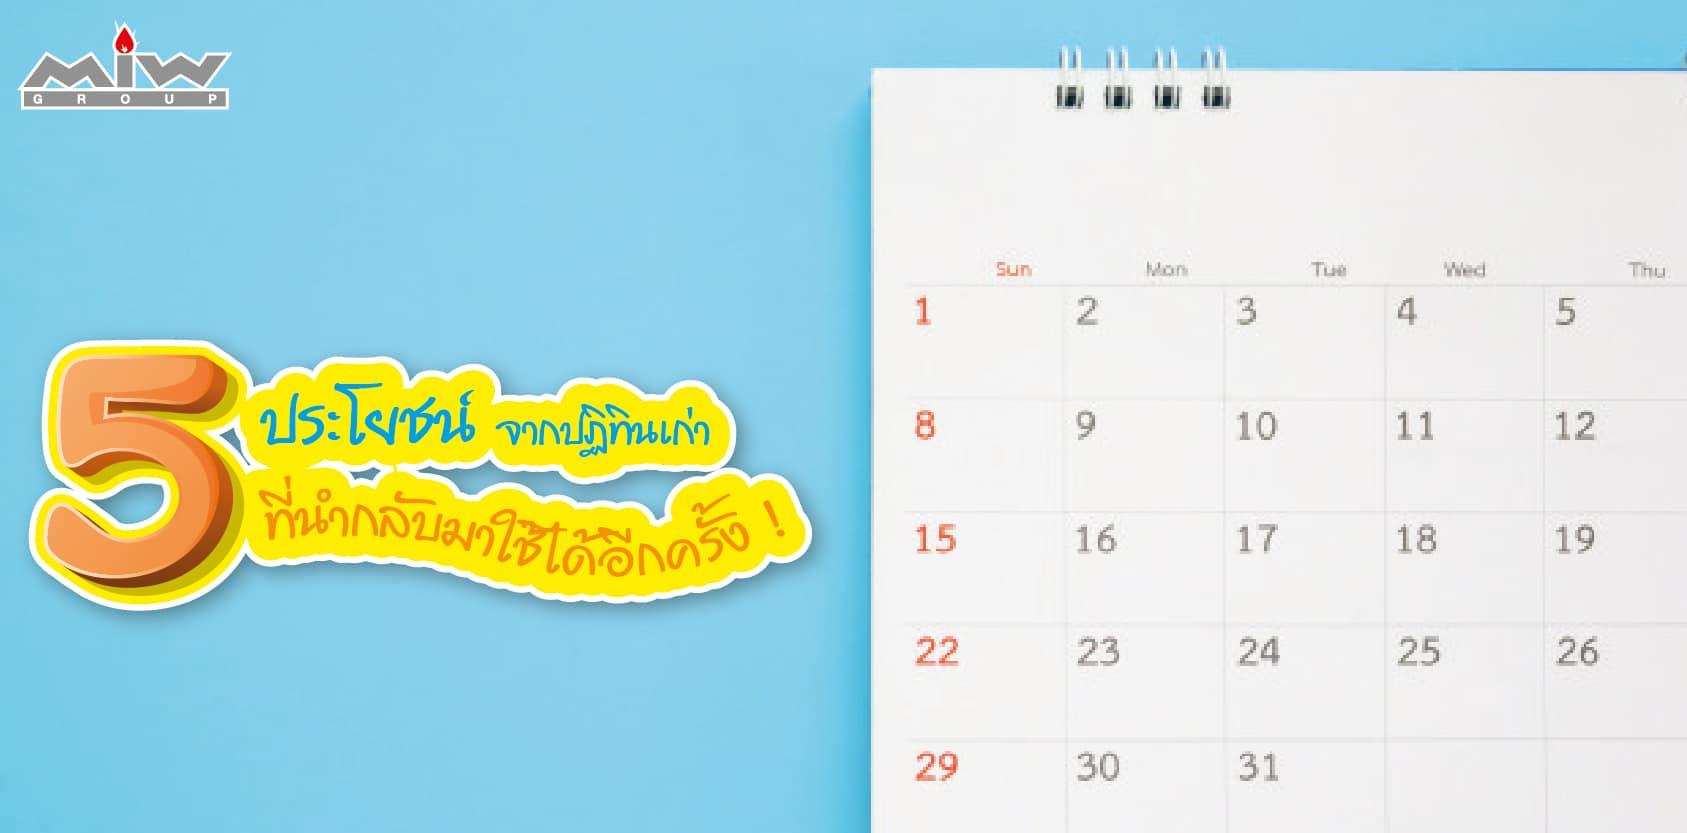 Website Old calendar - 5 ประโยชน์จากปฏิทินเก่า ที่นำกลับมาใช้ได้อีกครั้ง !